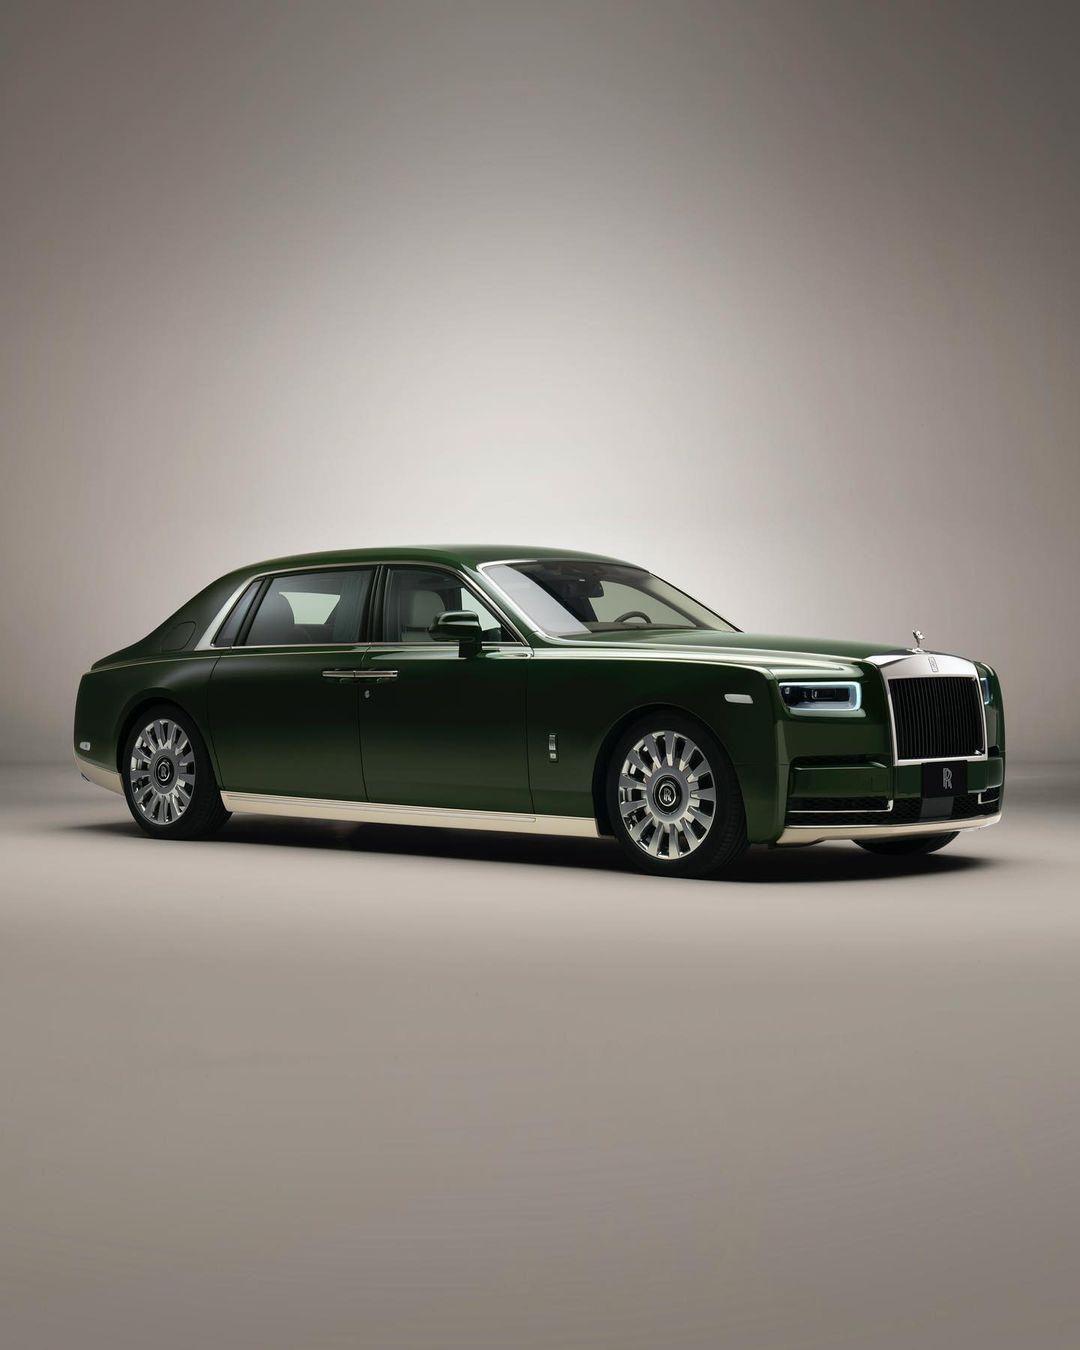 A Rolls-Royce Phantom Oribe típusa